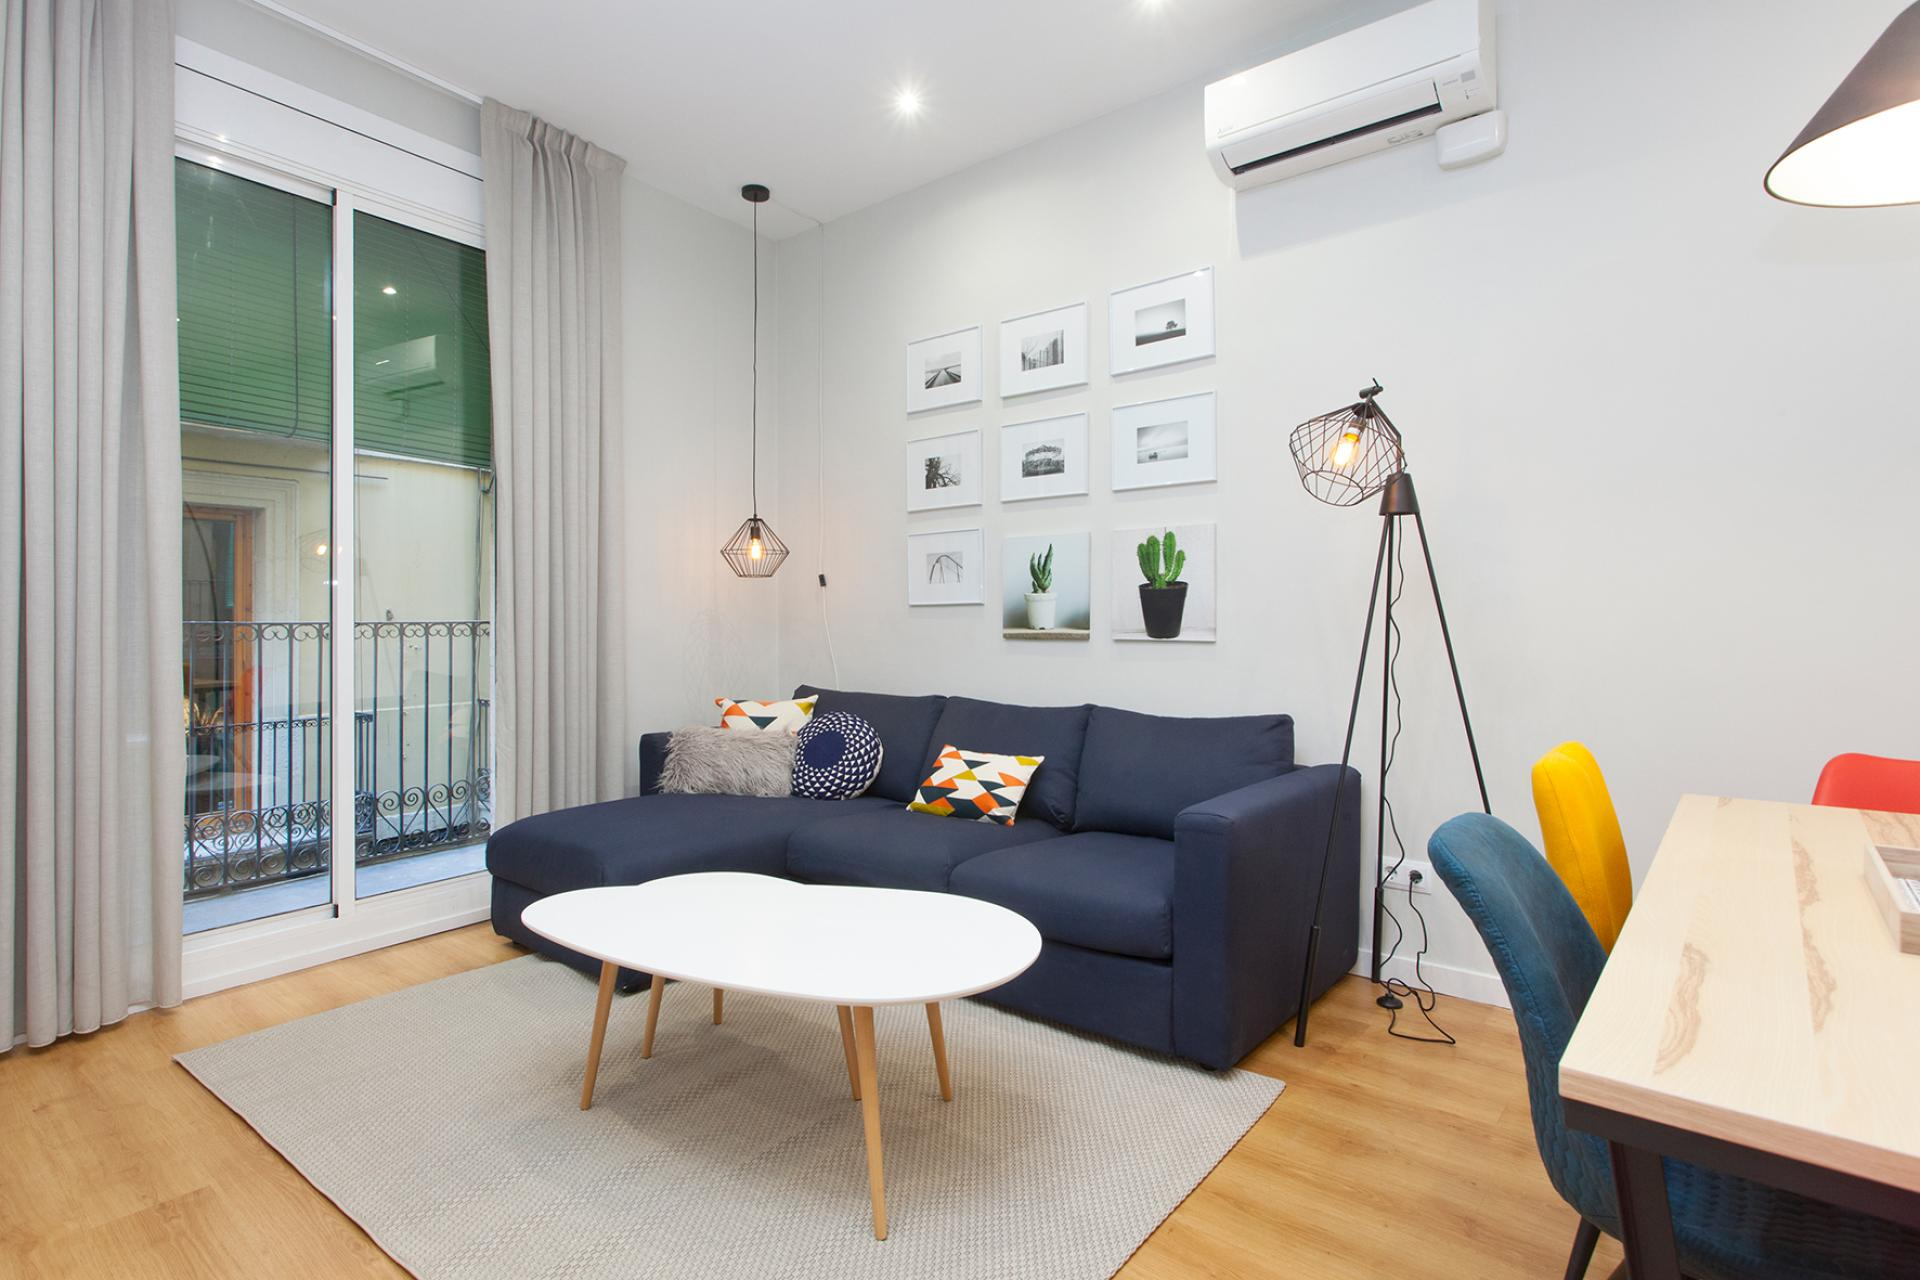 Large 3 bedroom family flat in Ferlandina - Macba